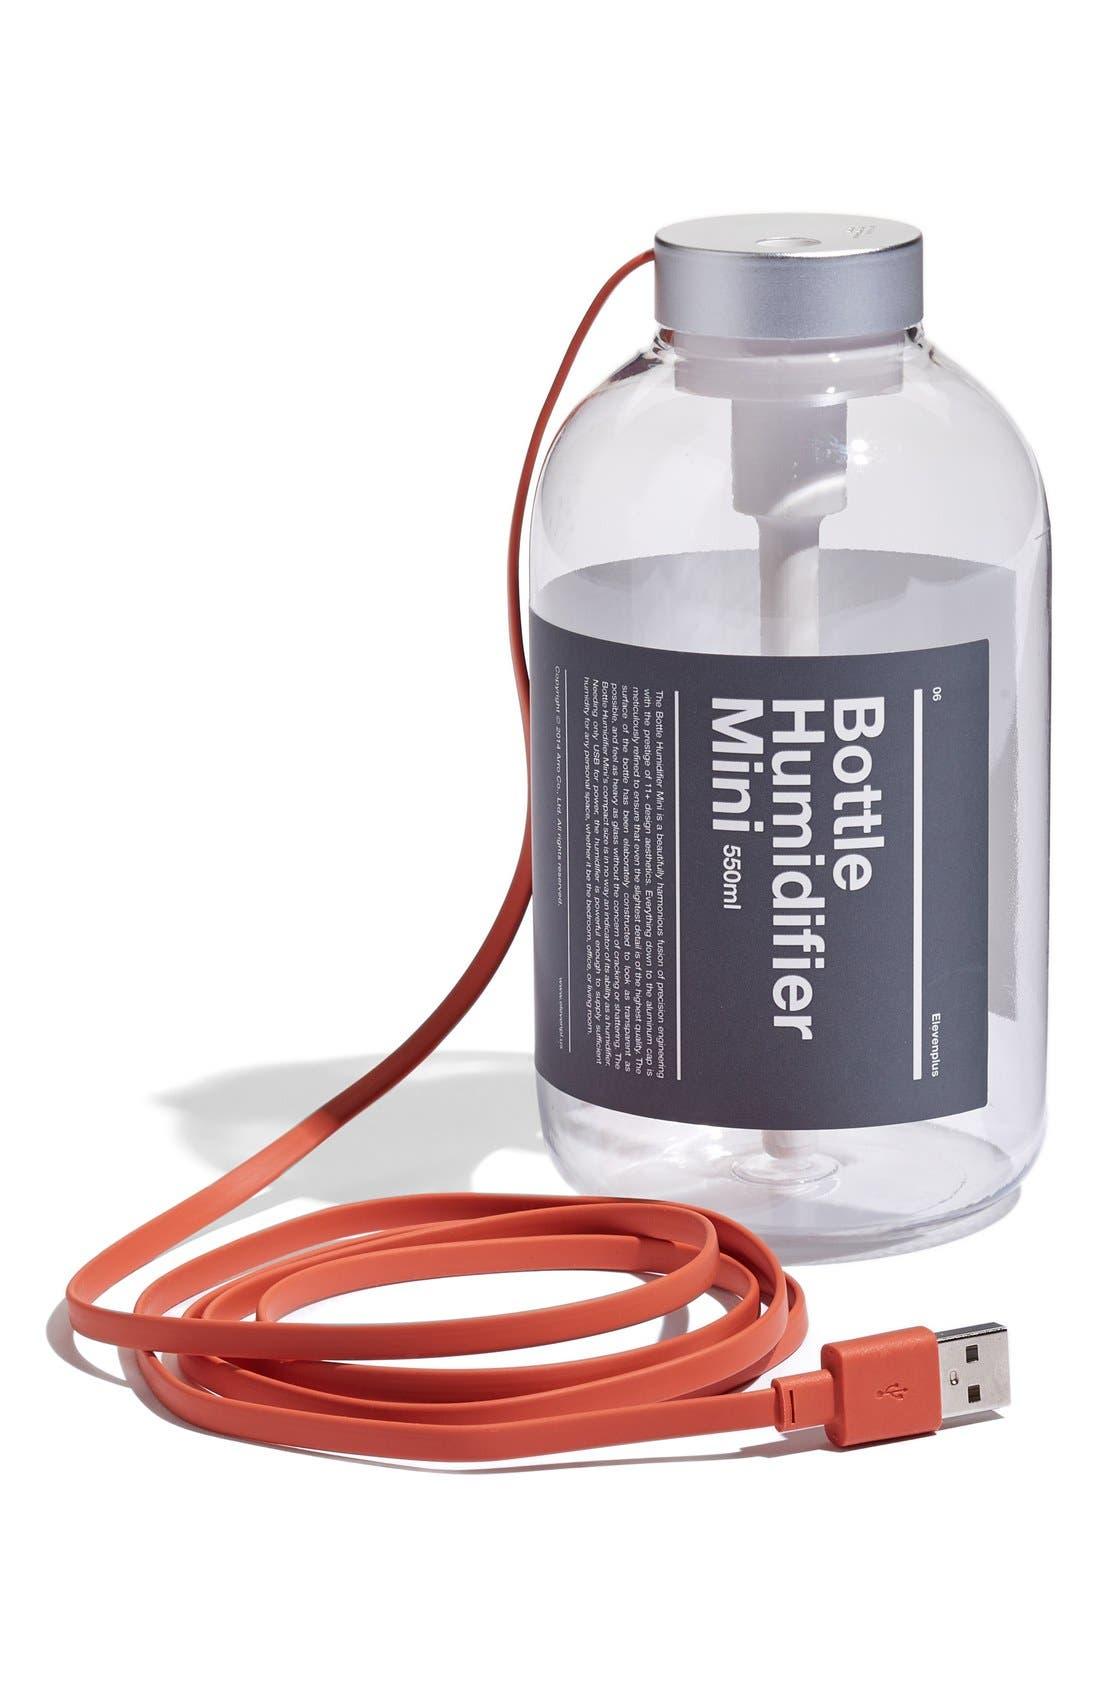 '11+ Bottle Humidifier Mini' USB Travel Humidifier,                             Main thumbnail 1, color,                             001